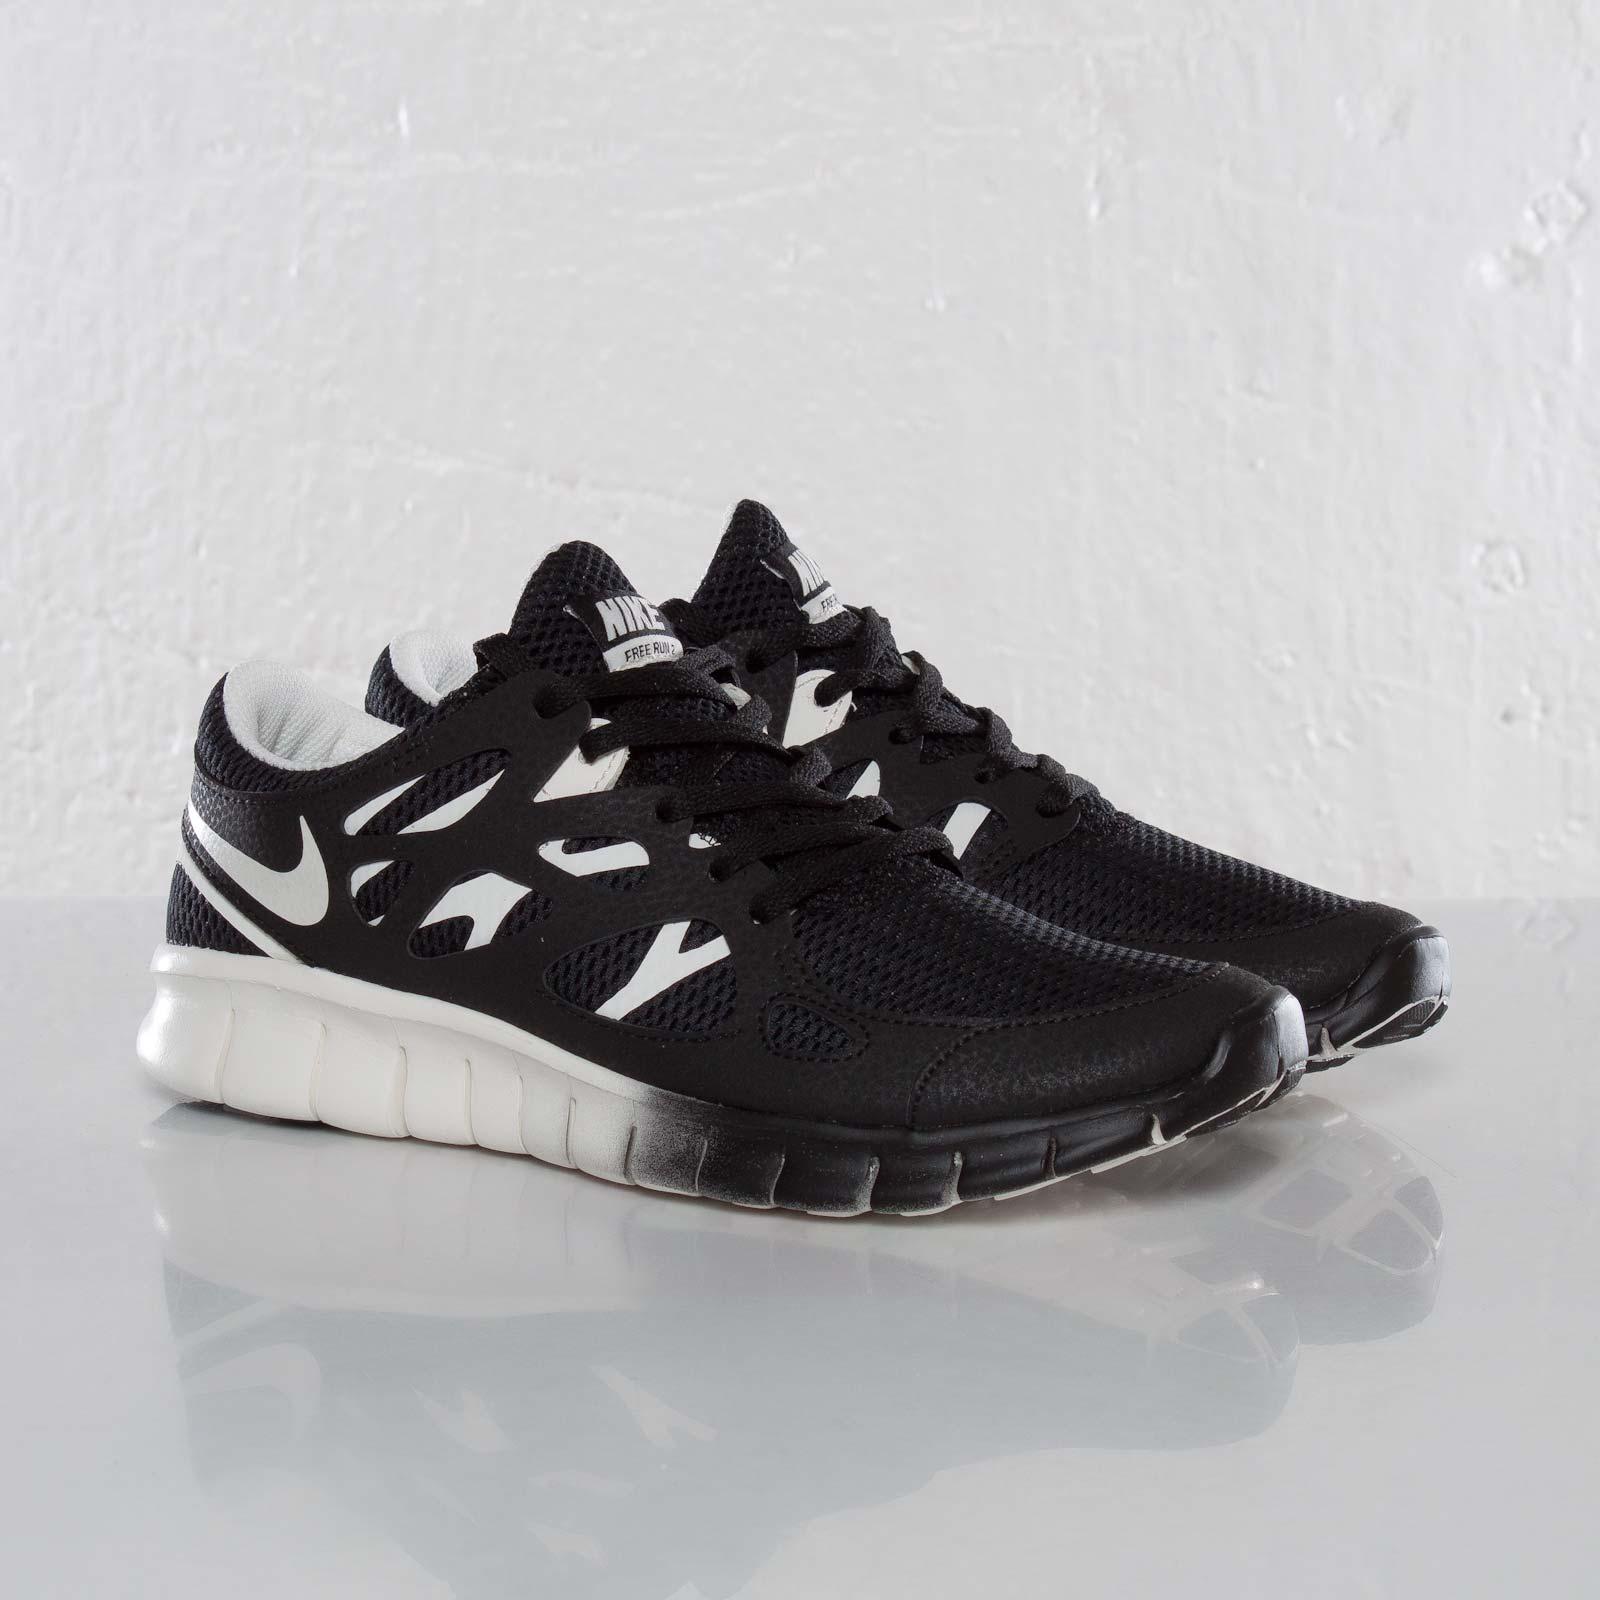 uk availability fd1f5 b393a Nike Wmns Free Run 2 EXT